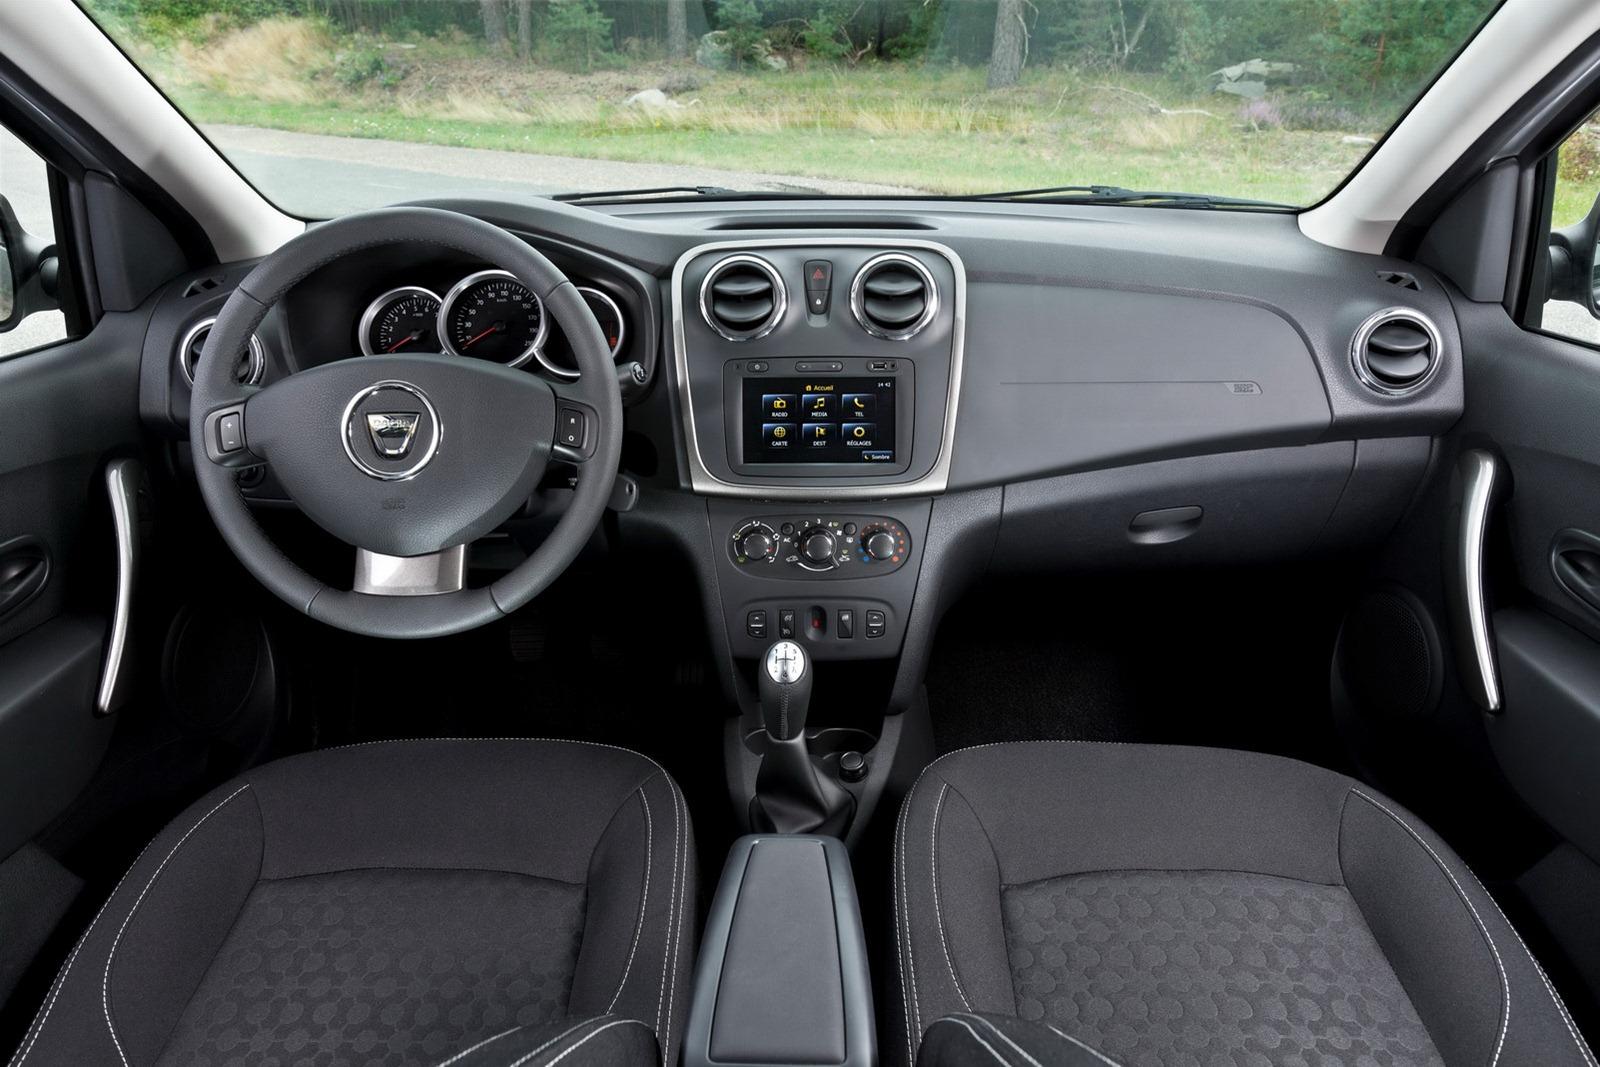 Dacia_Sandero_Interior